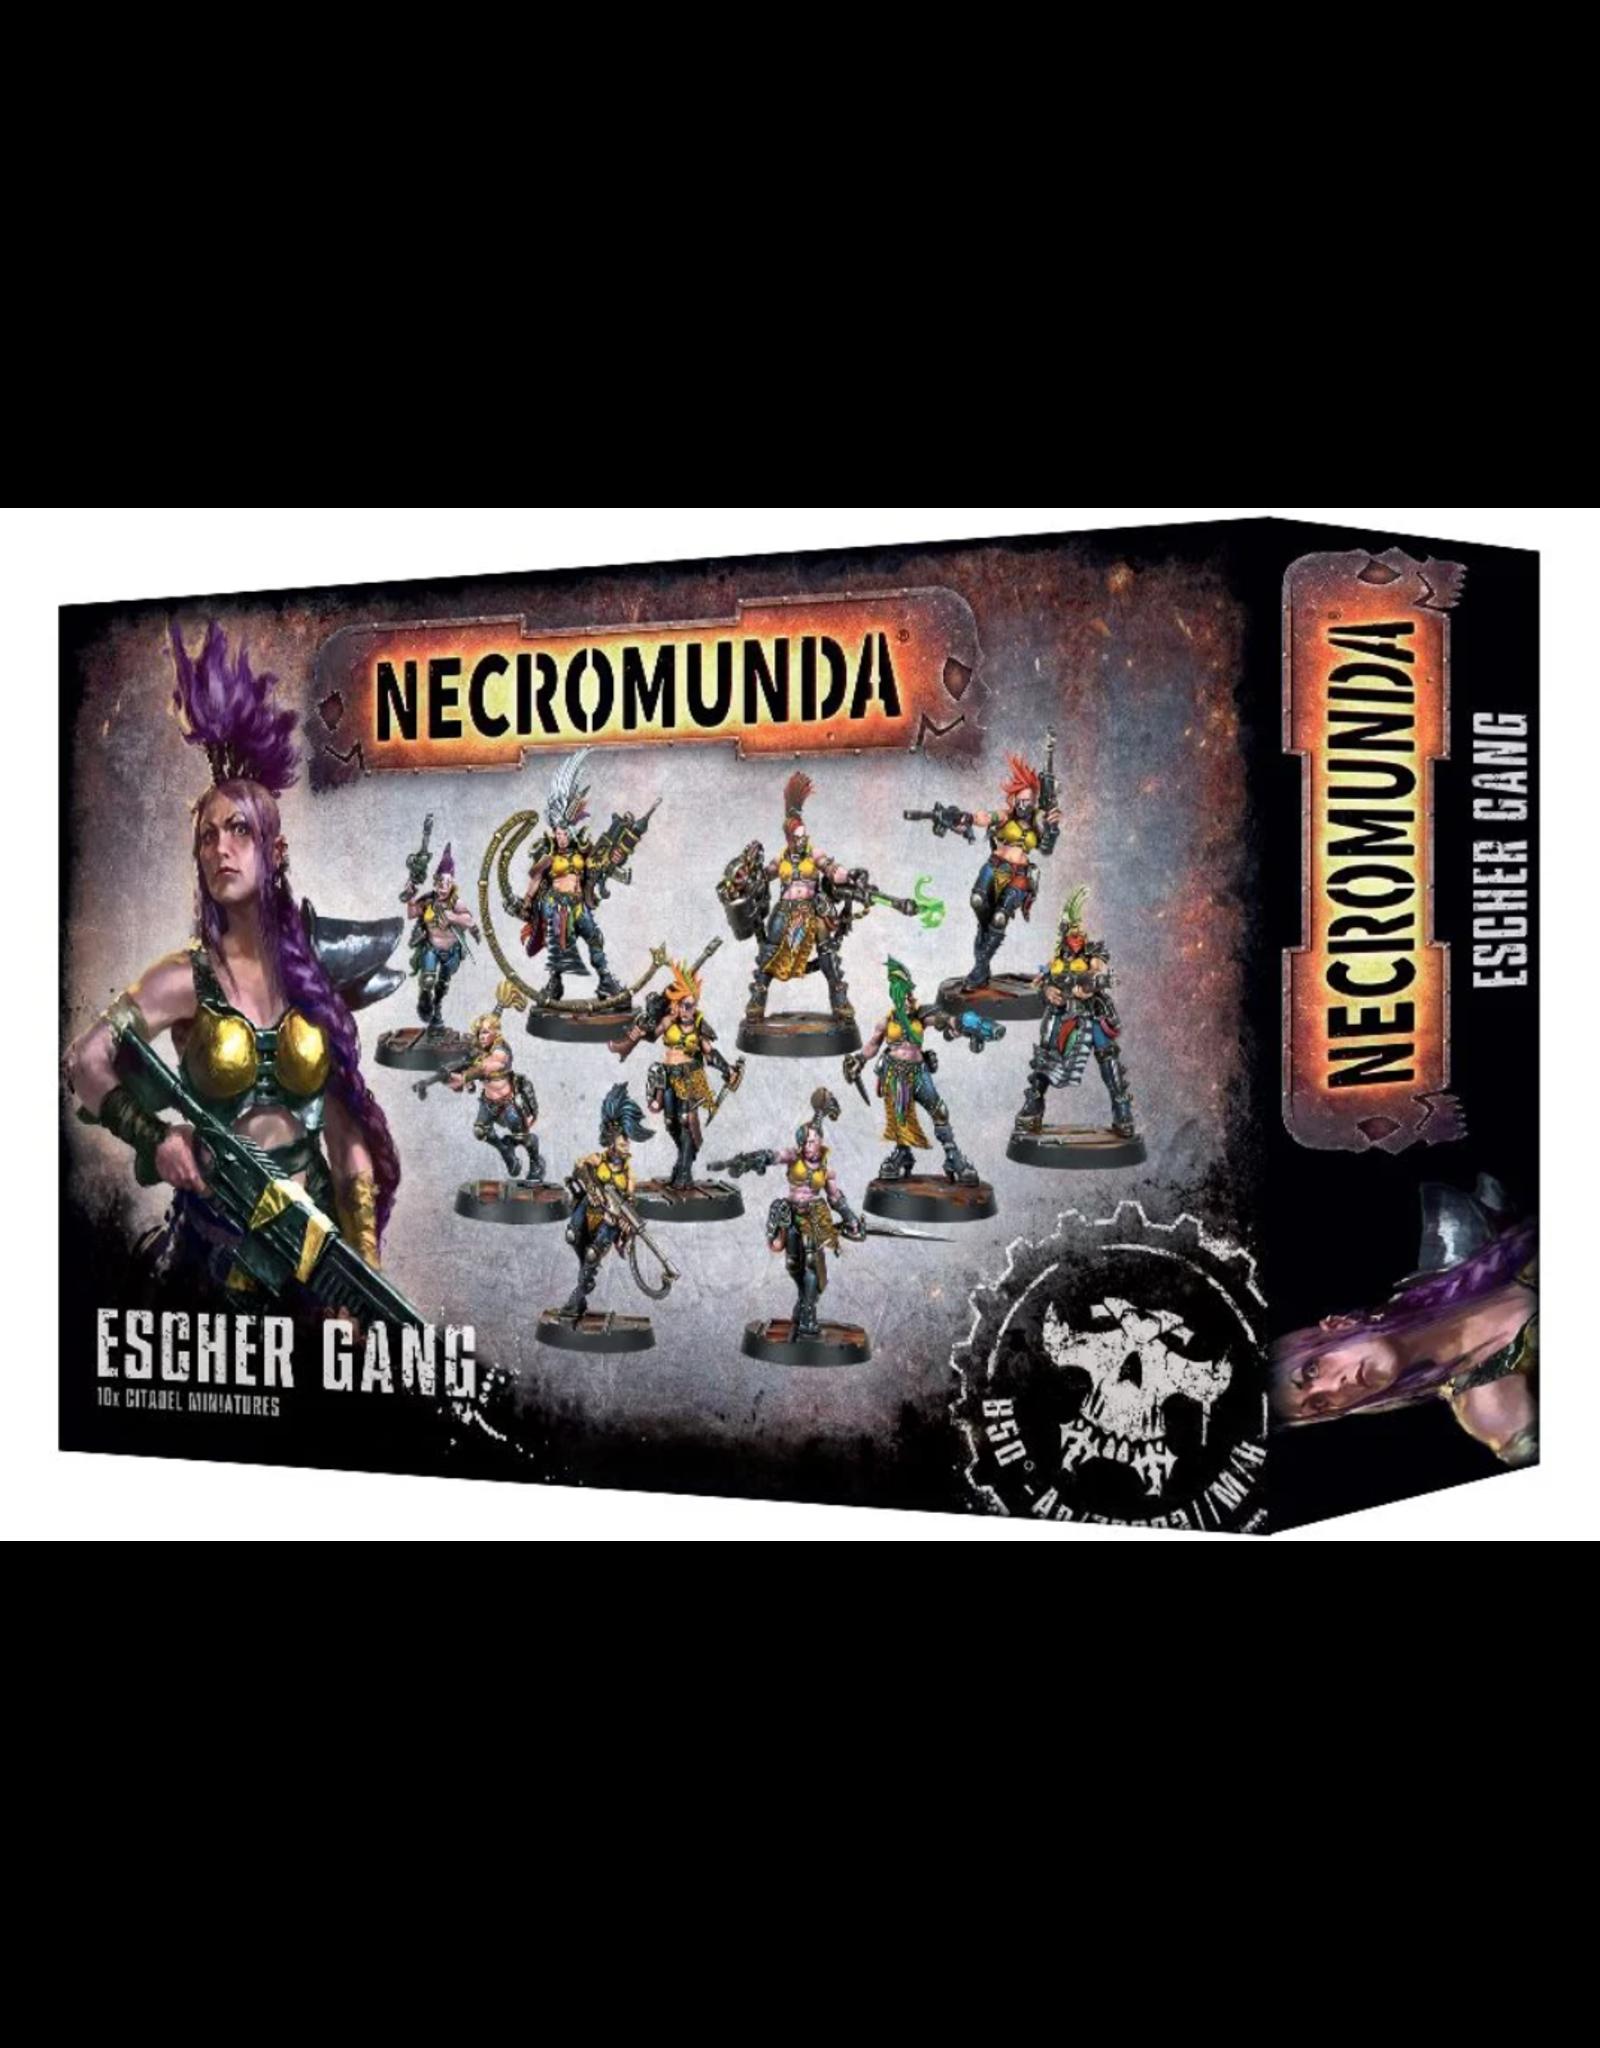 Necromunda Necromunda: Escher Gang